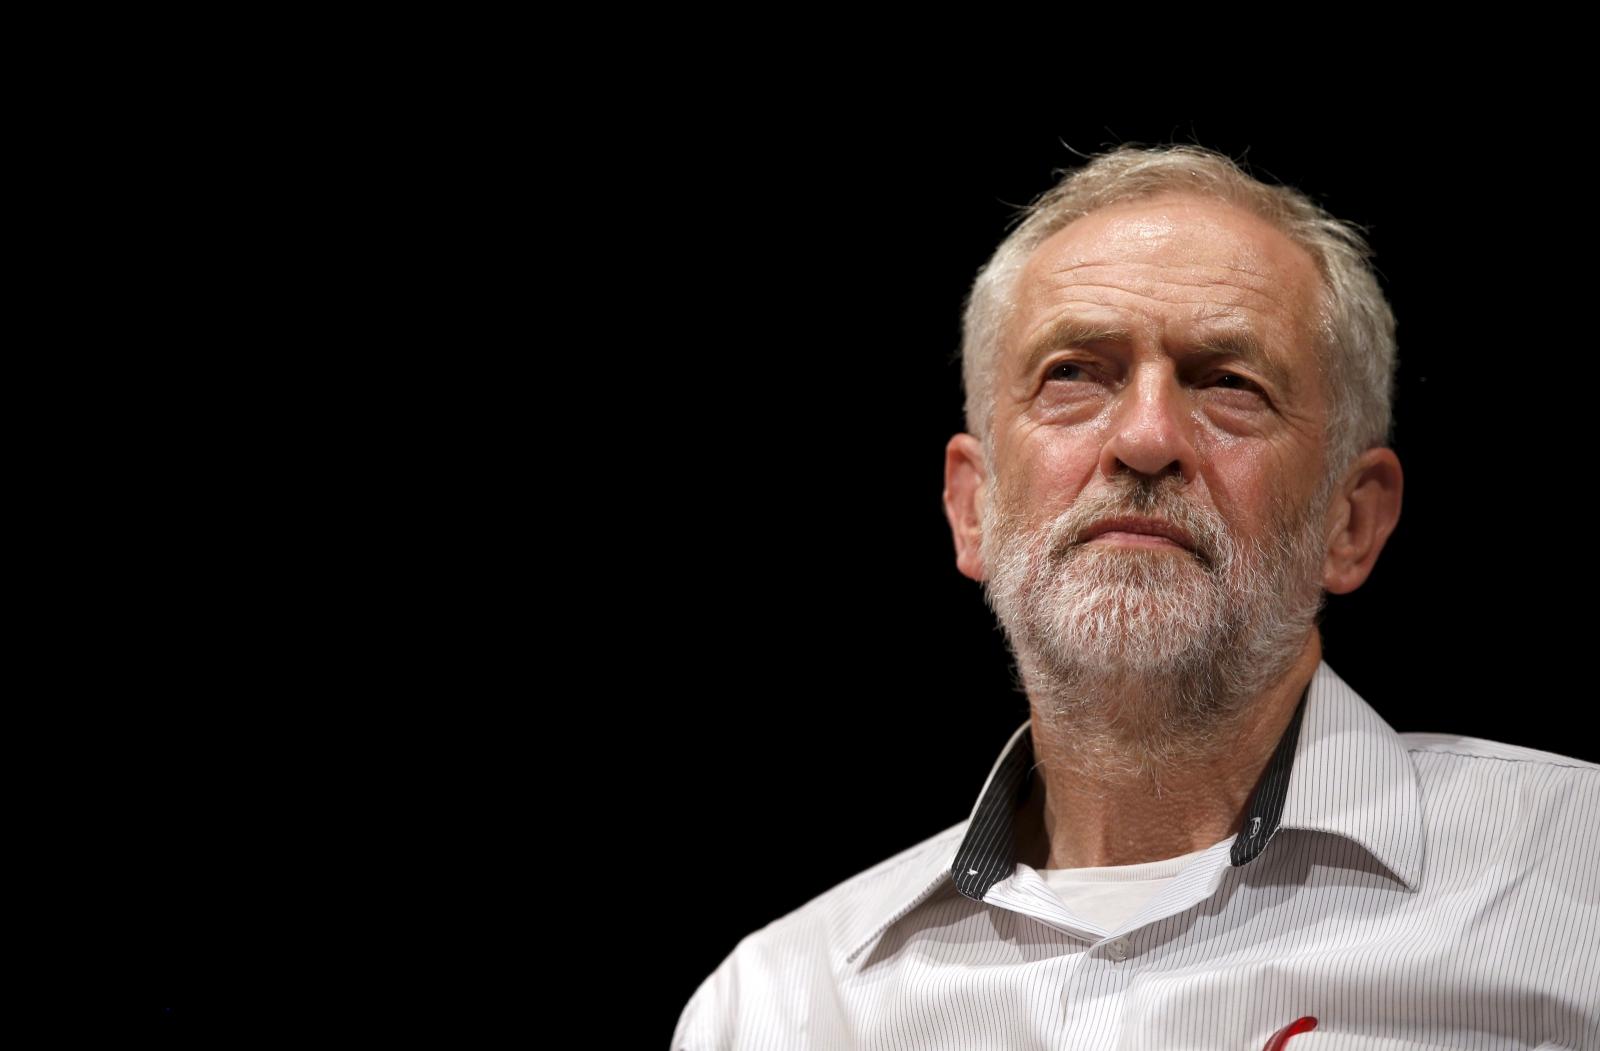 Jeremy Corbyn Labour leadership election